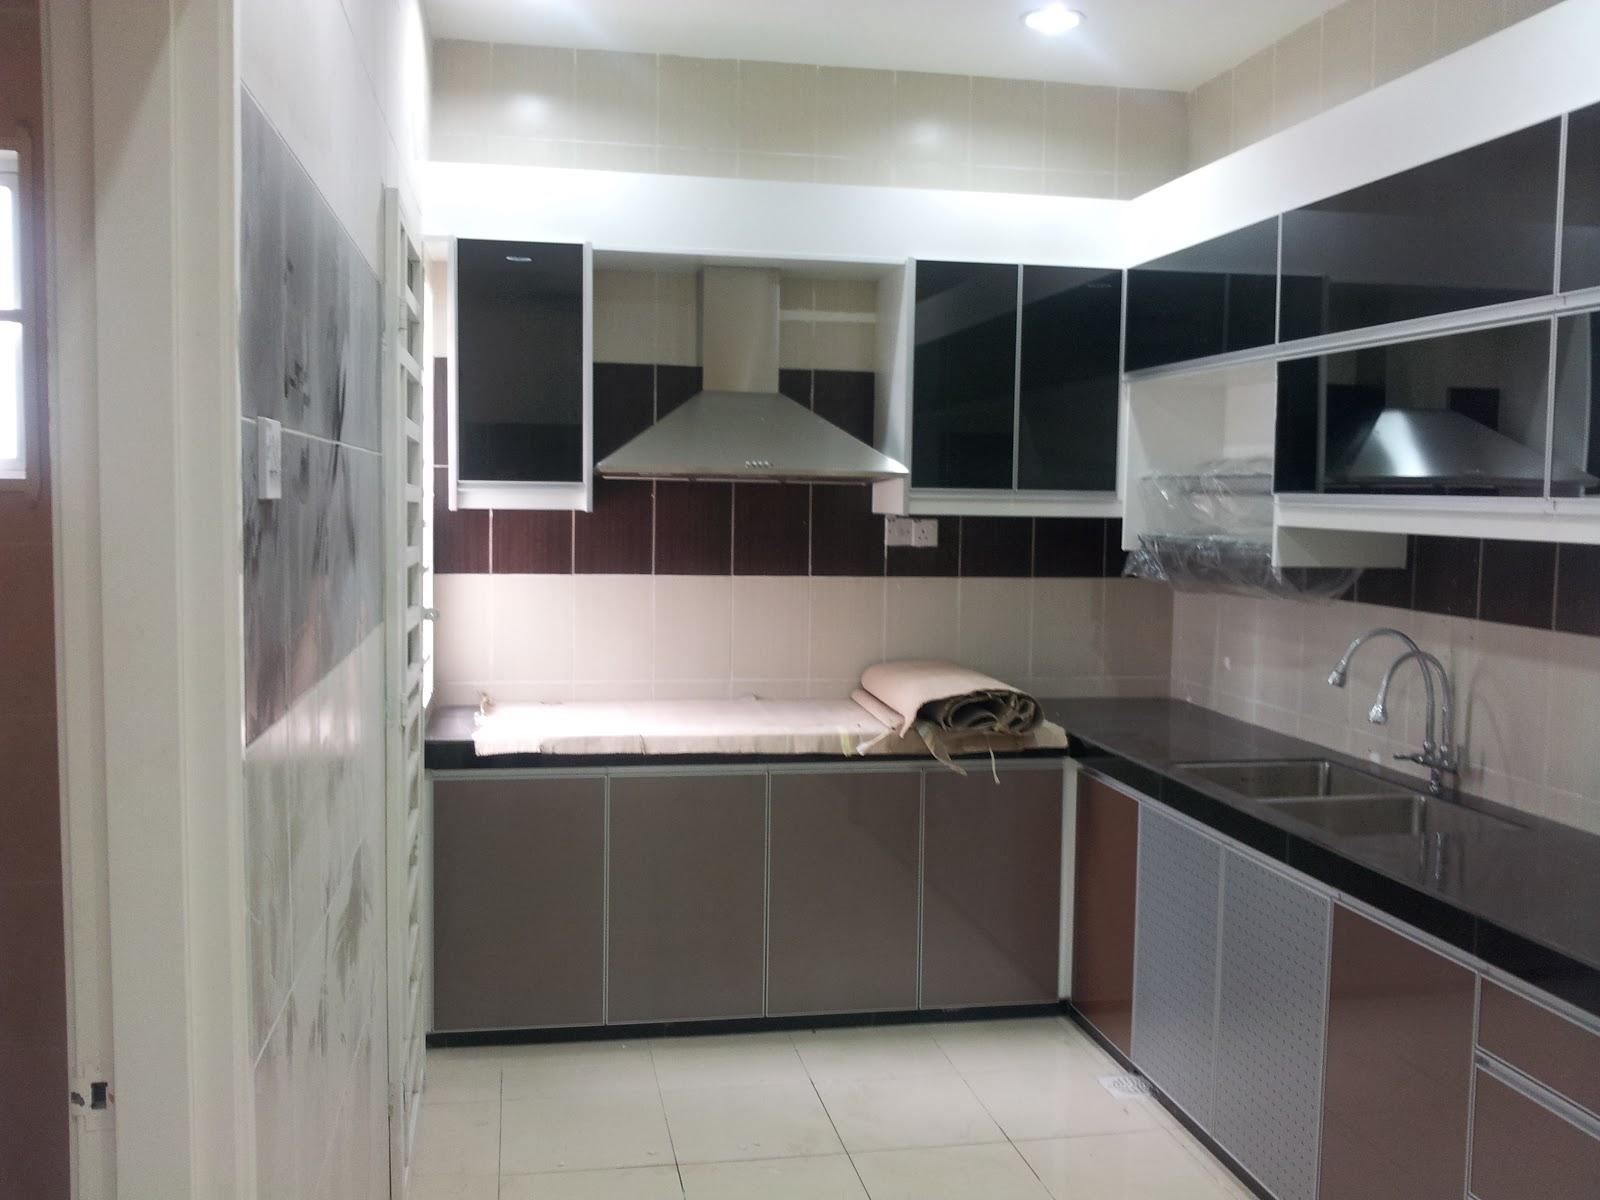 A b a h a h m a d kitchen cabinet murah part 2 for Kitchen cabinet murah 2016